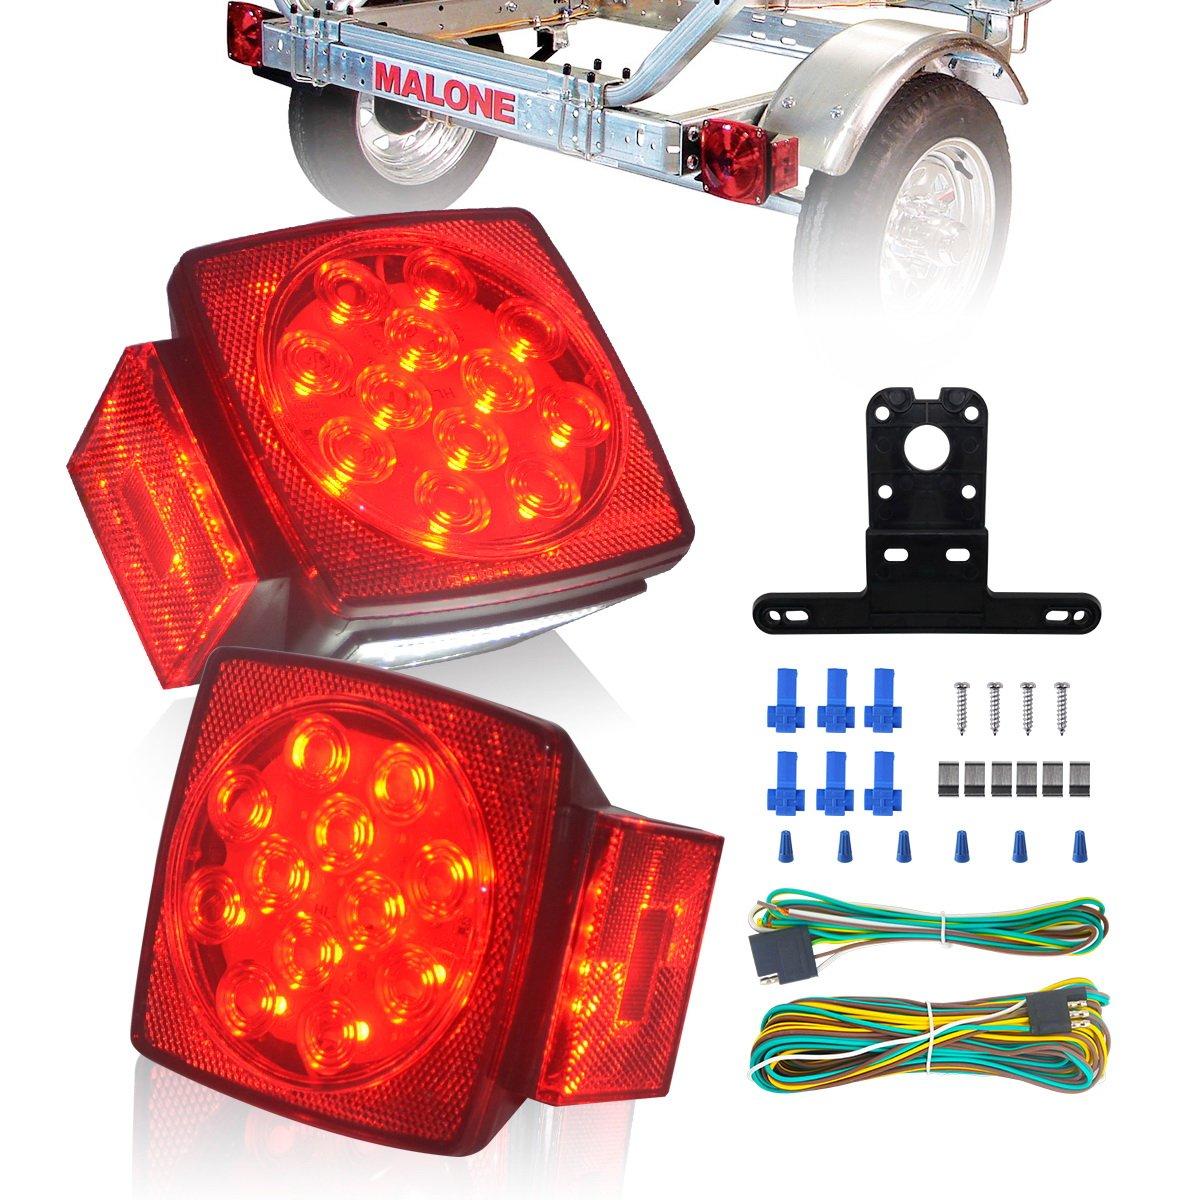 1set 2 Headlight Harness H4 Relay H6054 Wiring Diagram Toyota Pickup Headlights